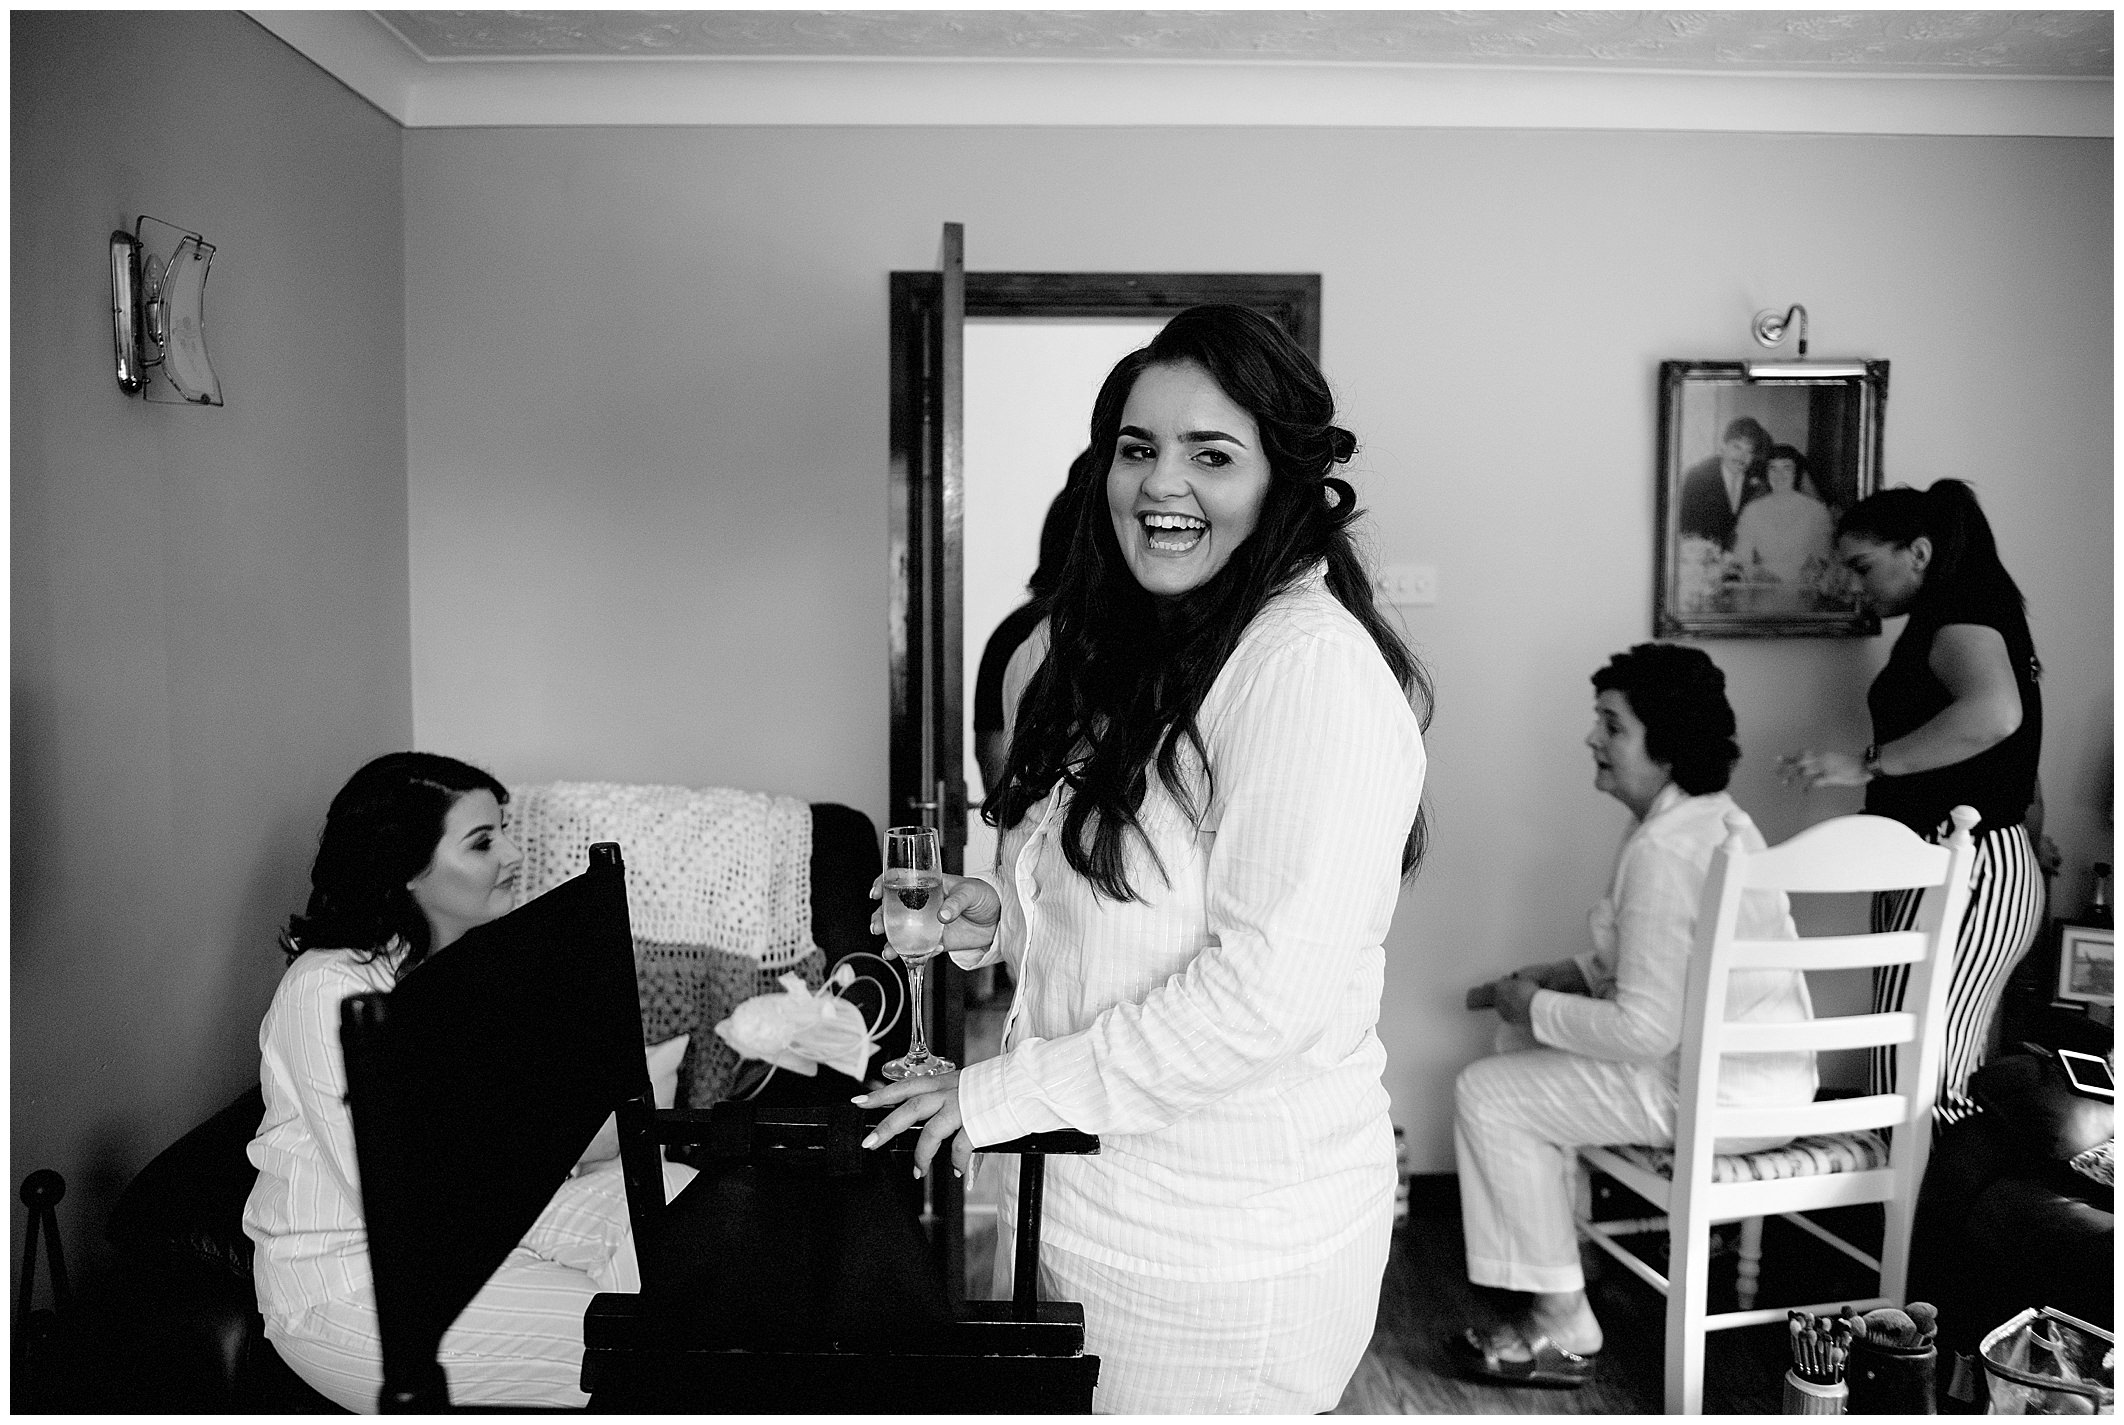 redcastle-hotel-wedding-karen-brian-jude-browne-photography-010.jpg